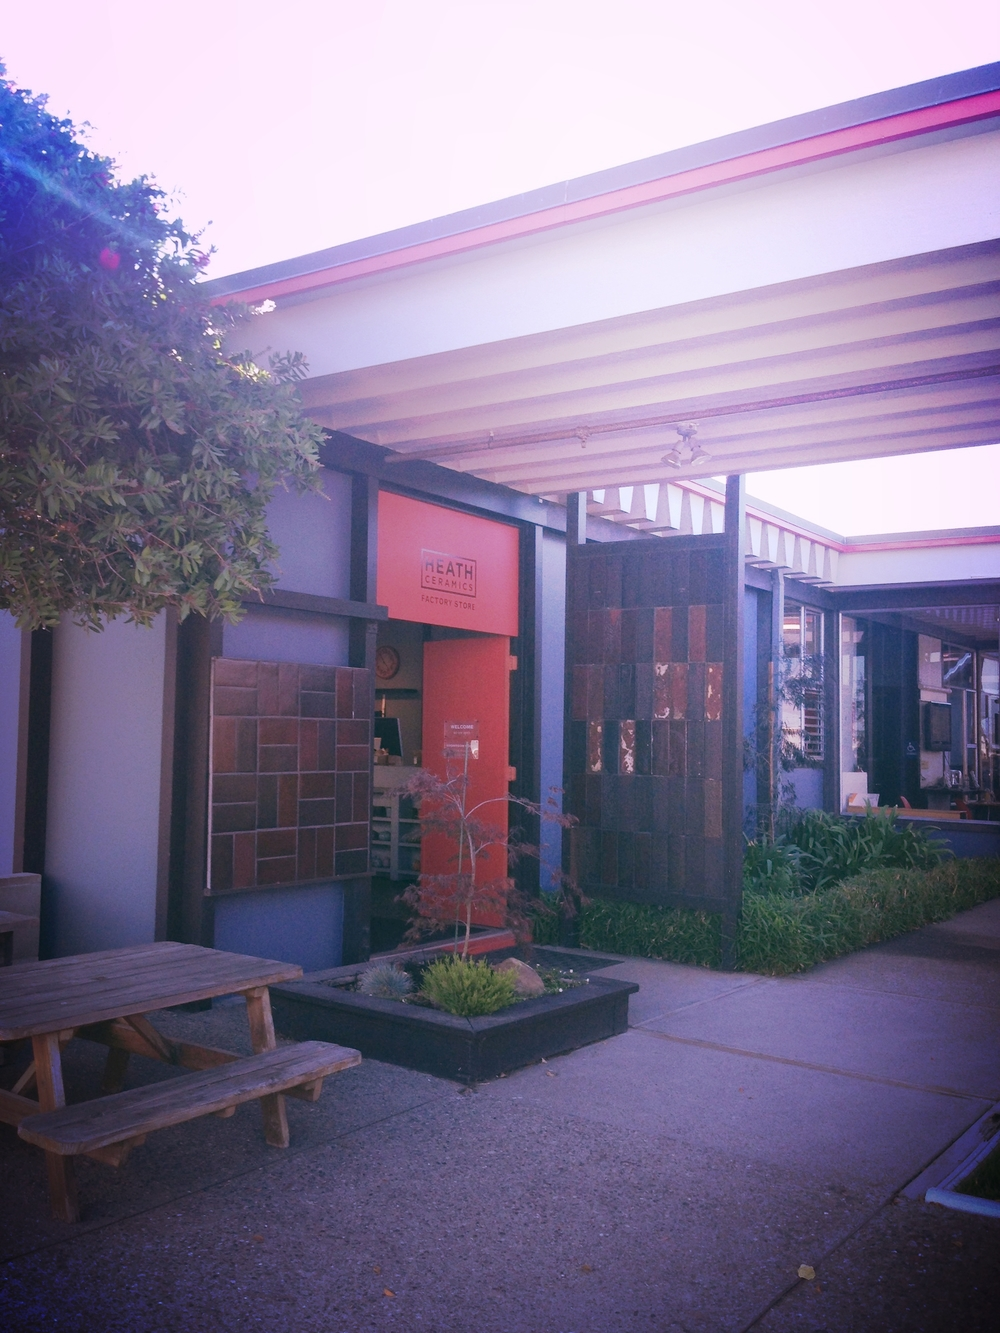 Heath Ceramics factory and store in Sausalito